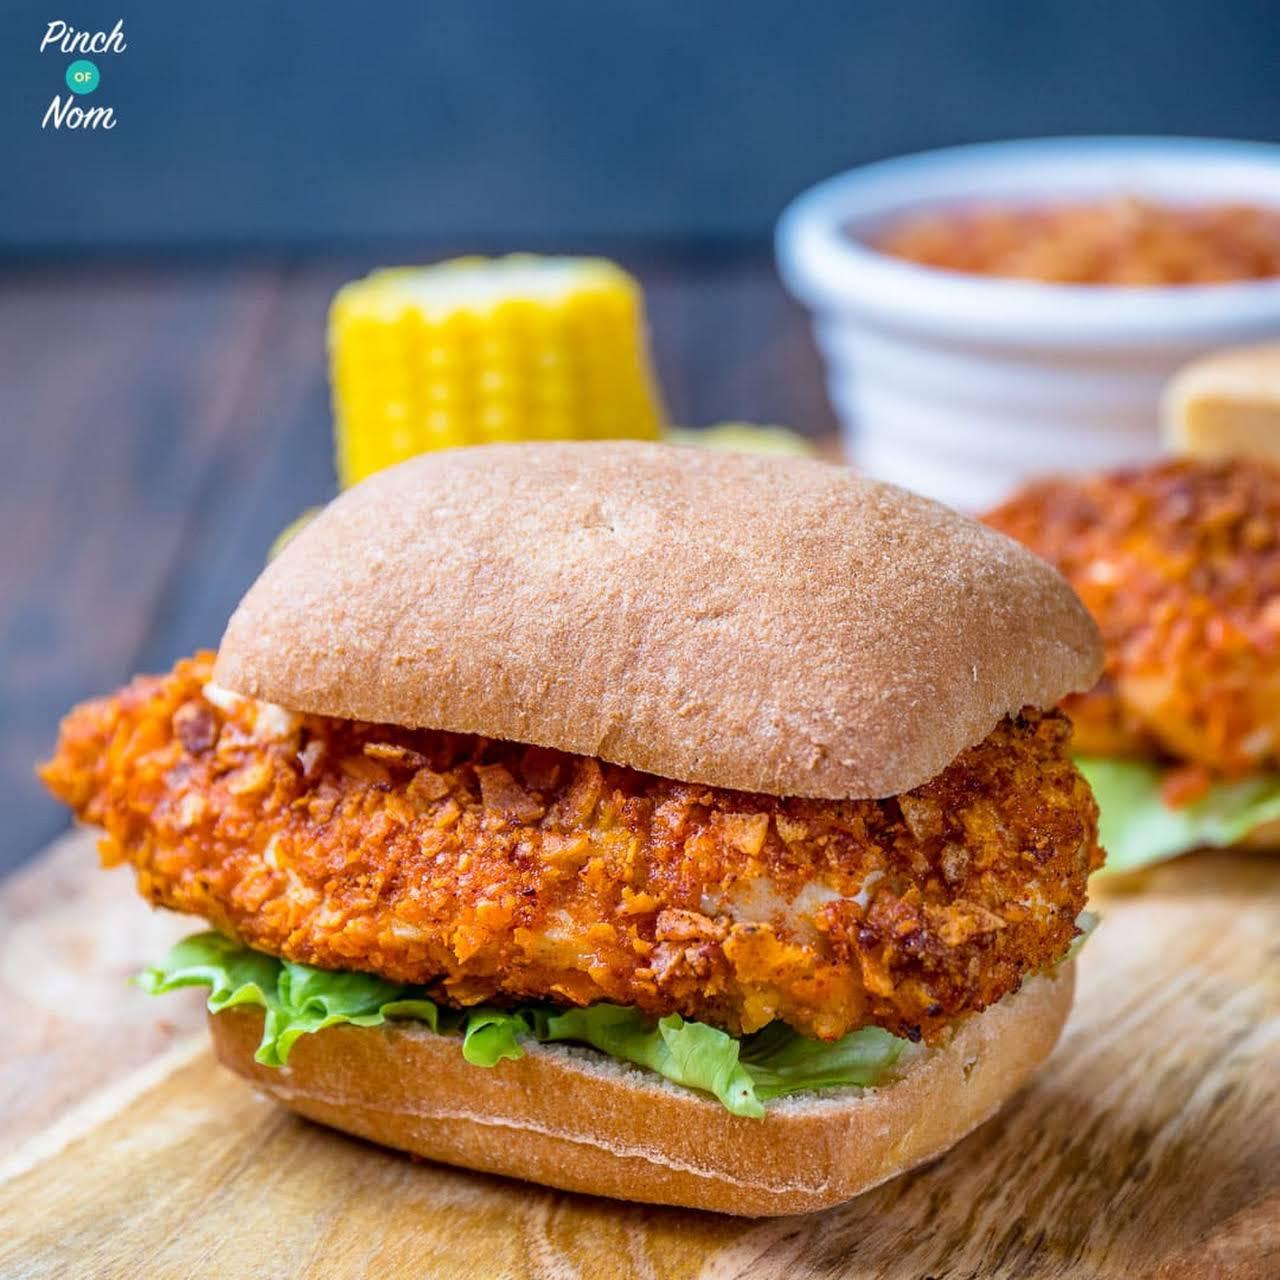 KFC Zinger Burgers | Slimming World & Weight Watchers  affable